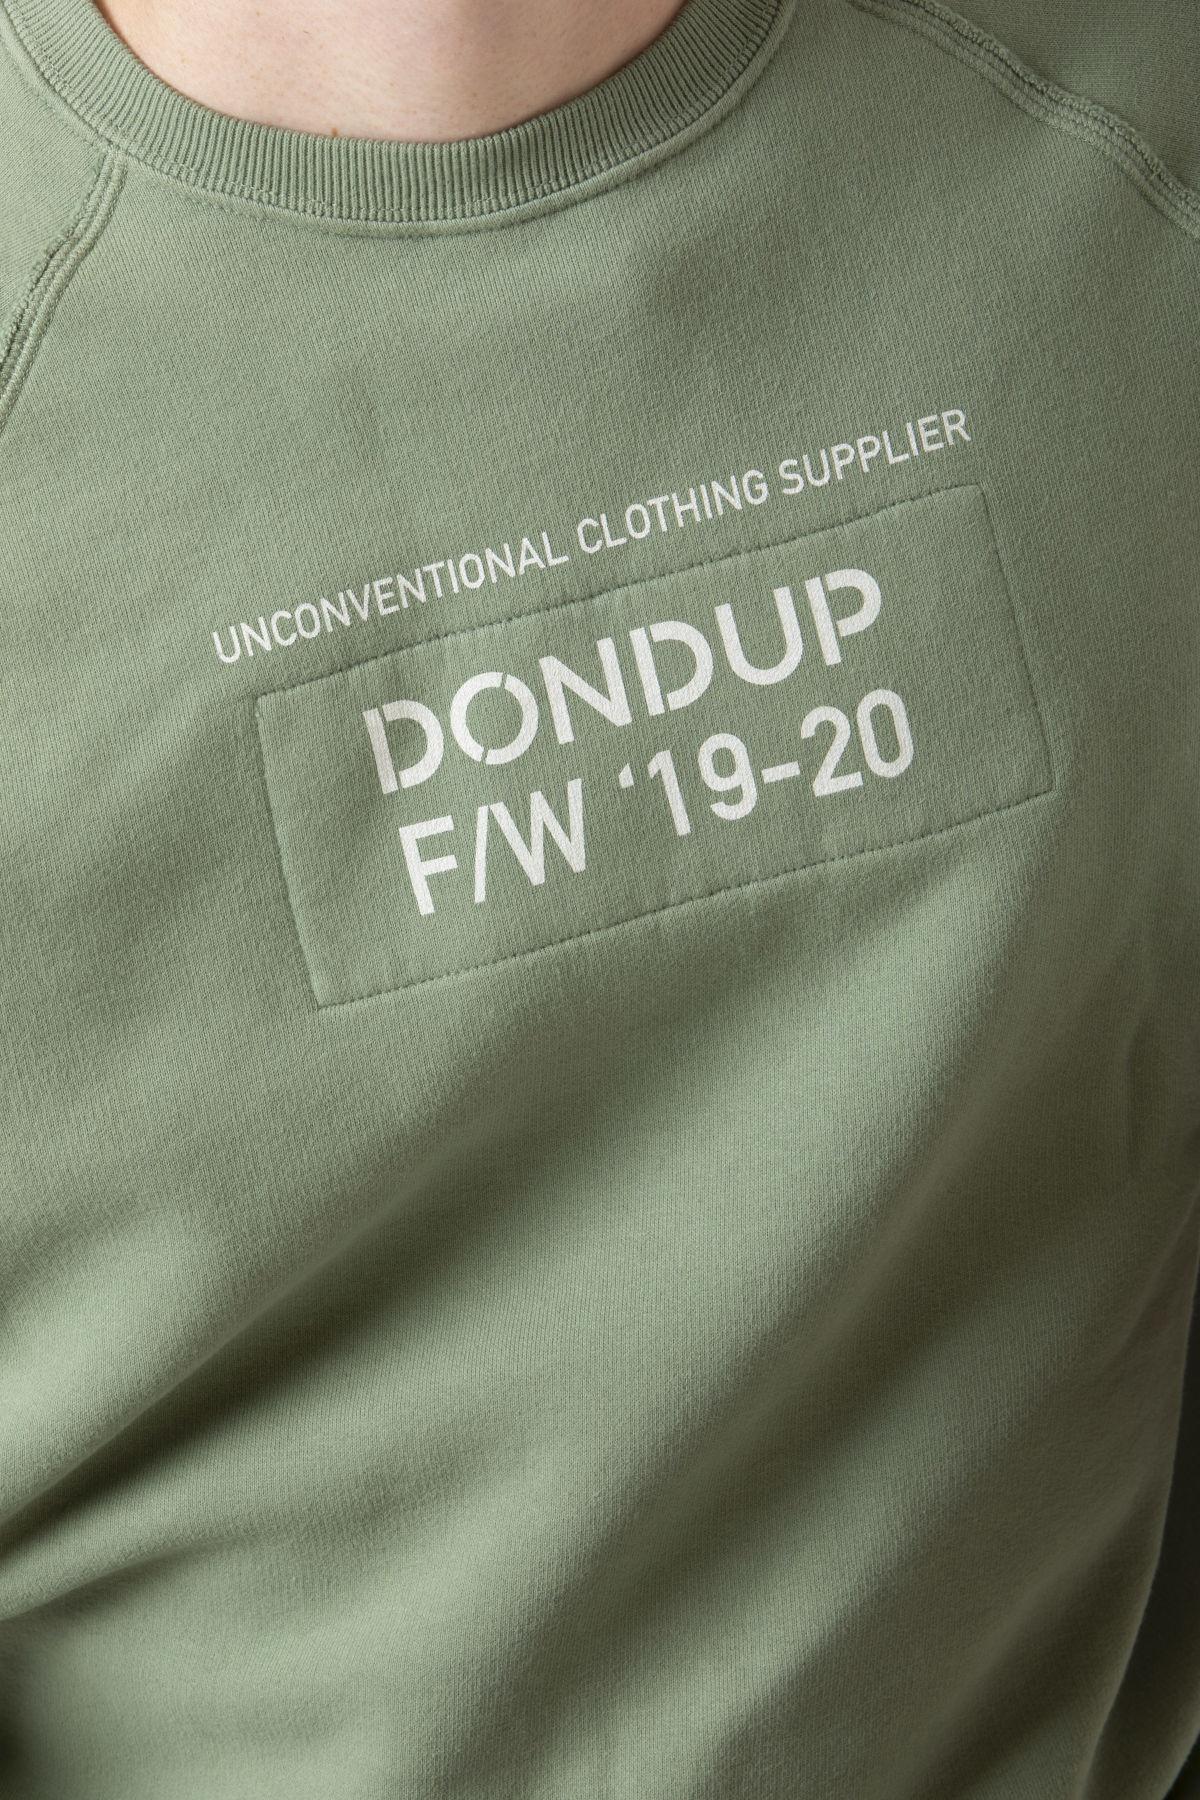 Felpa per uomo DONDUP A/I 19-20